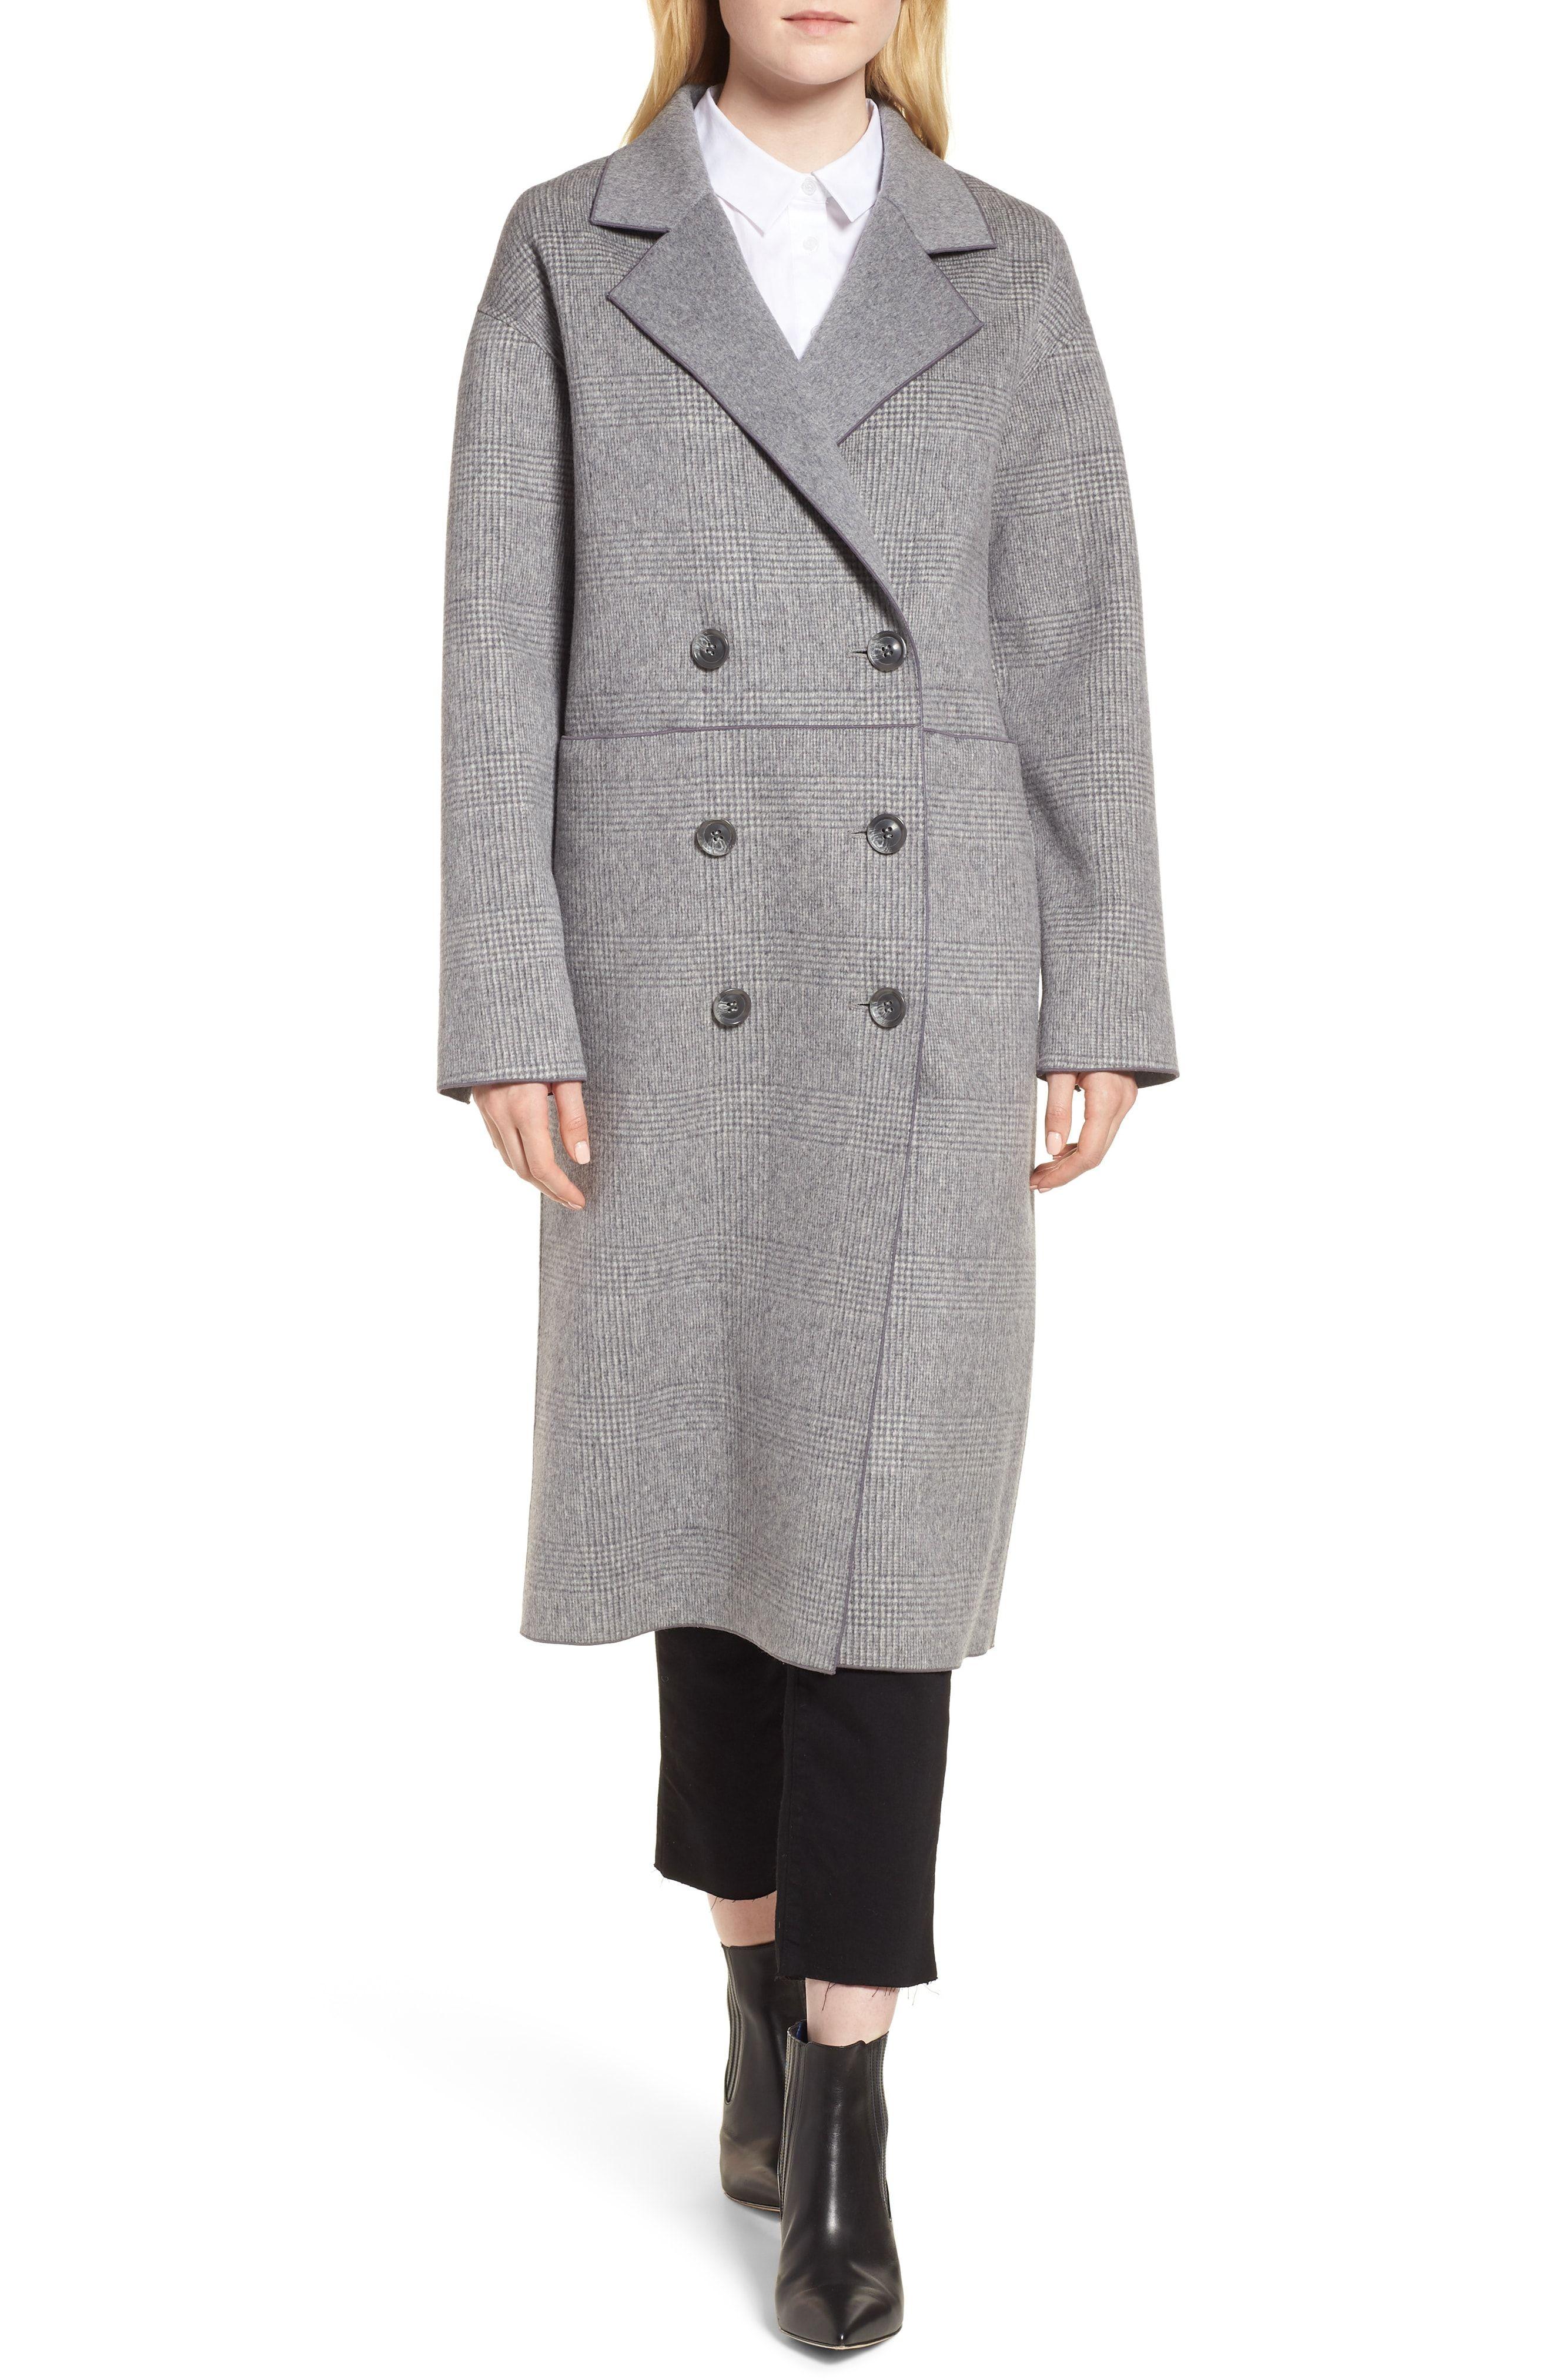 f4580a0b1eb Double Breasted Wool Coat. | Fall/Winter Wishlist | Wool coat ...